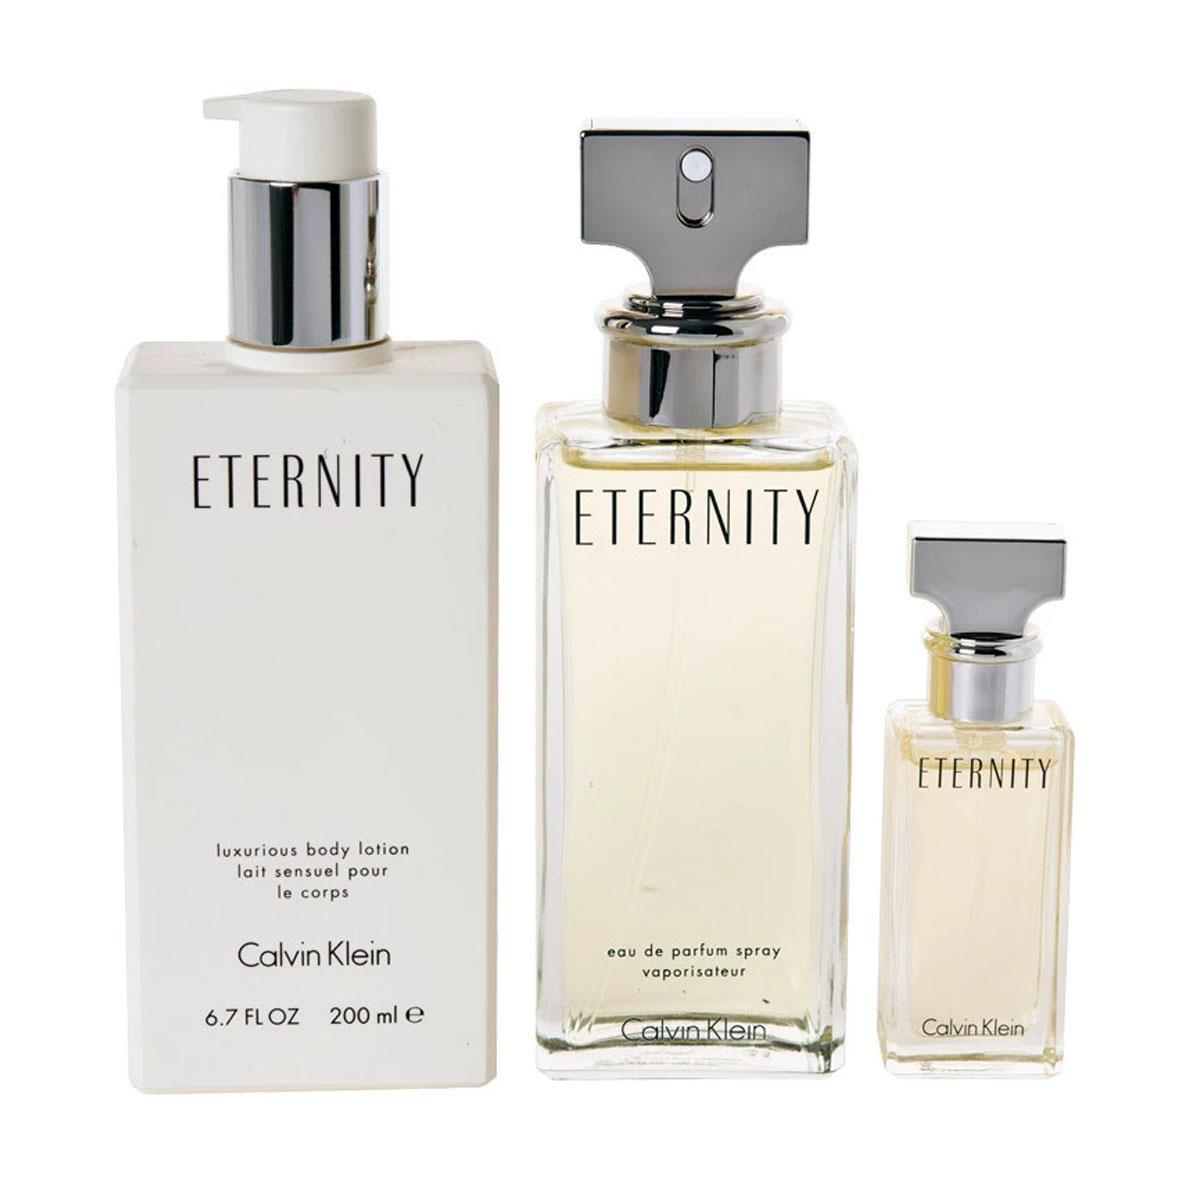 102623ed2e195 Coffret Calvin Klein Eternity Feminino - Eau de Parfum 100 ml + Miniatura  15 ml + Body Lotion 200 ml